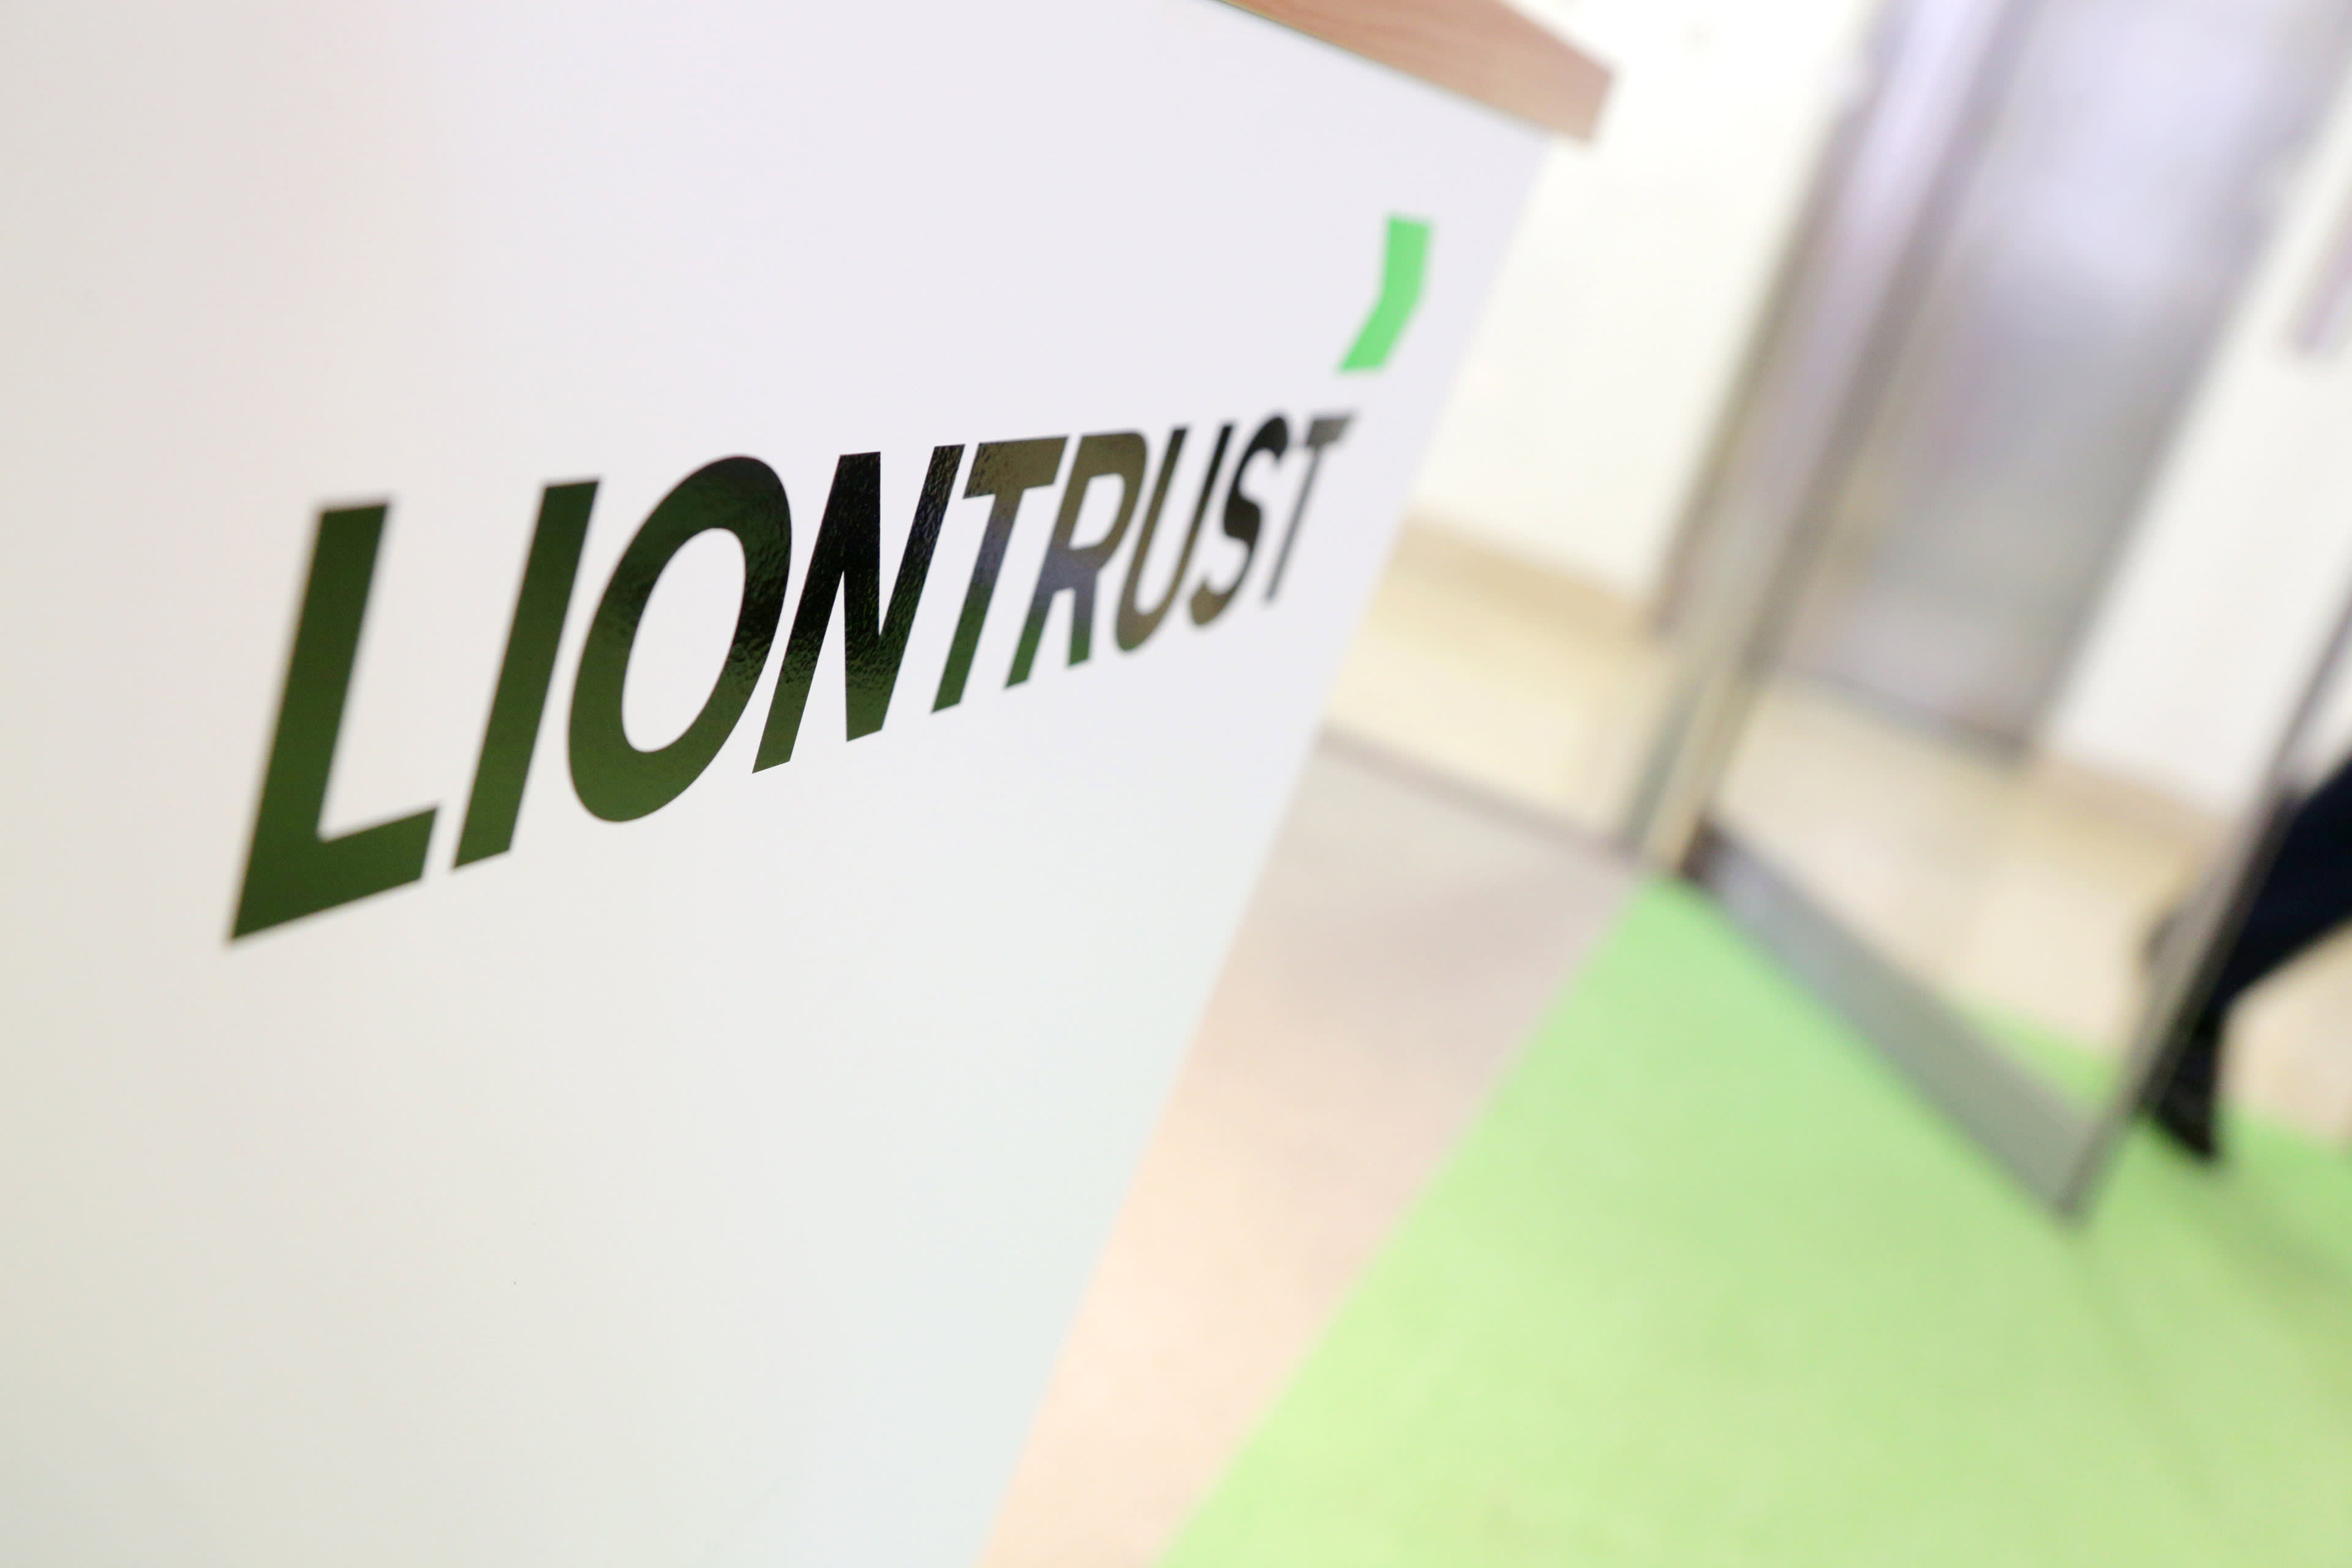 Liontrust pulls ESG trust IPO after limited interest